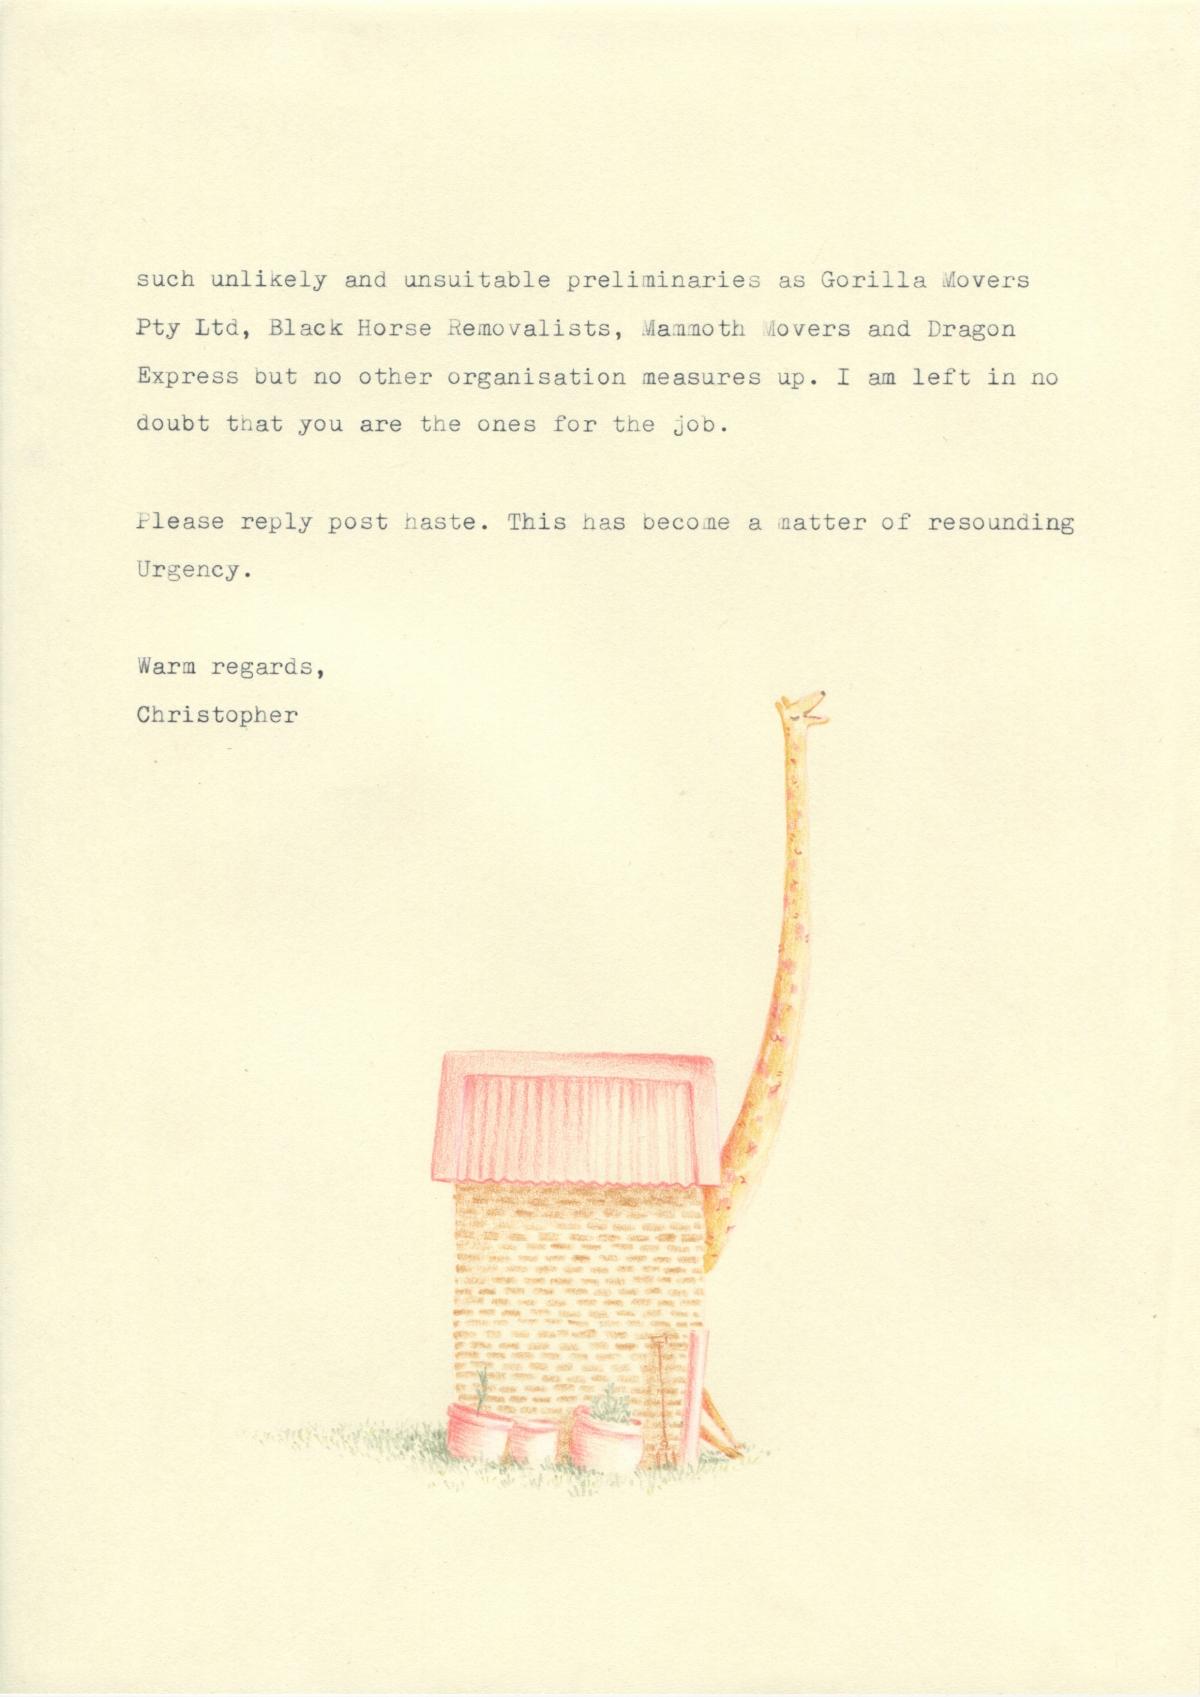 Letter to Giraffe Removals